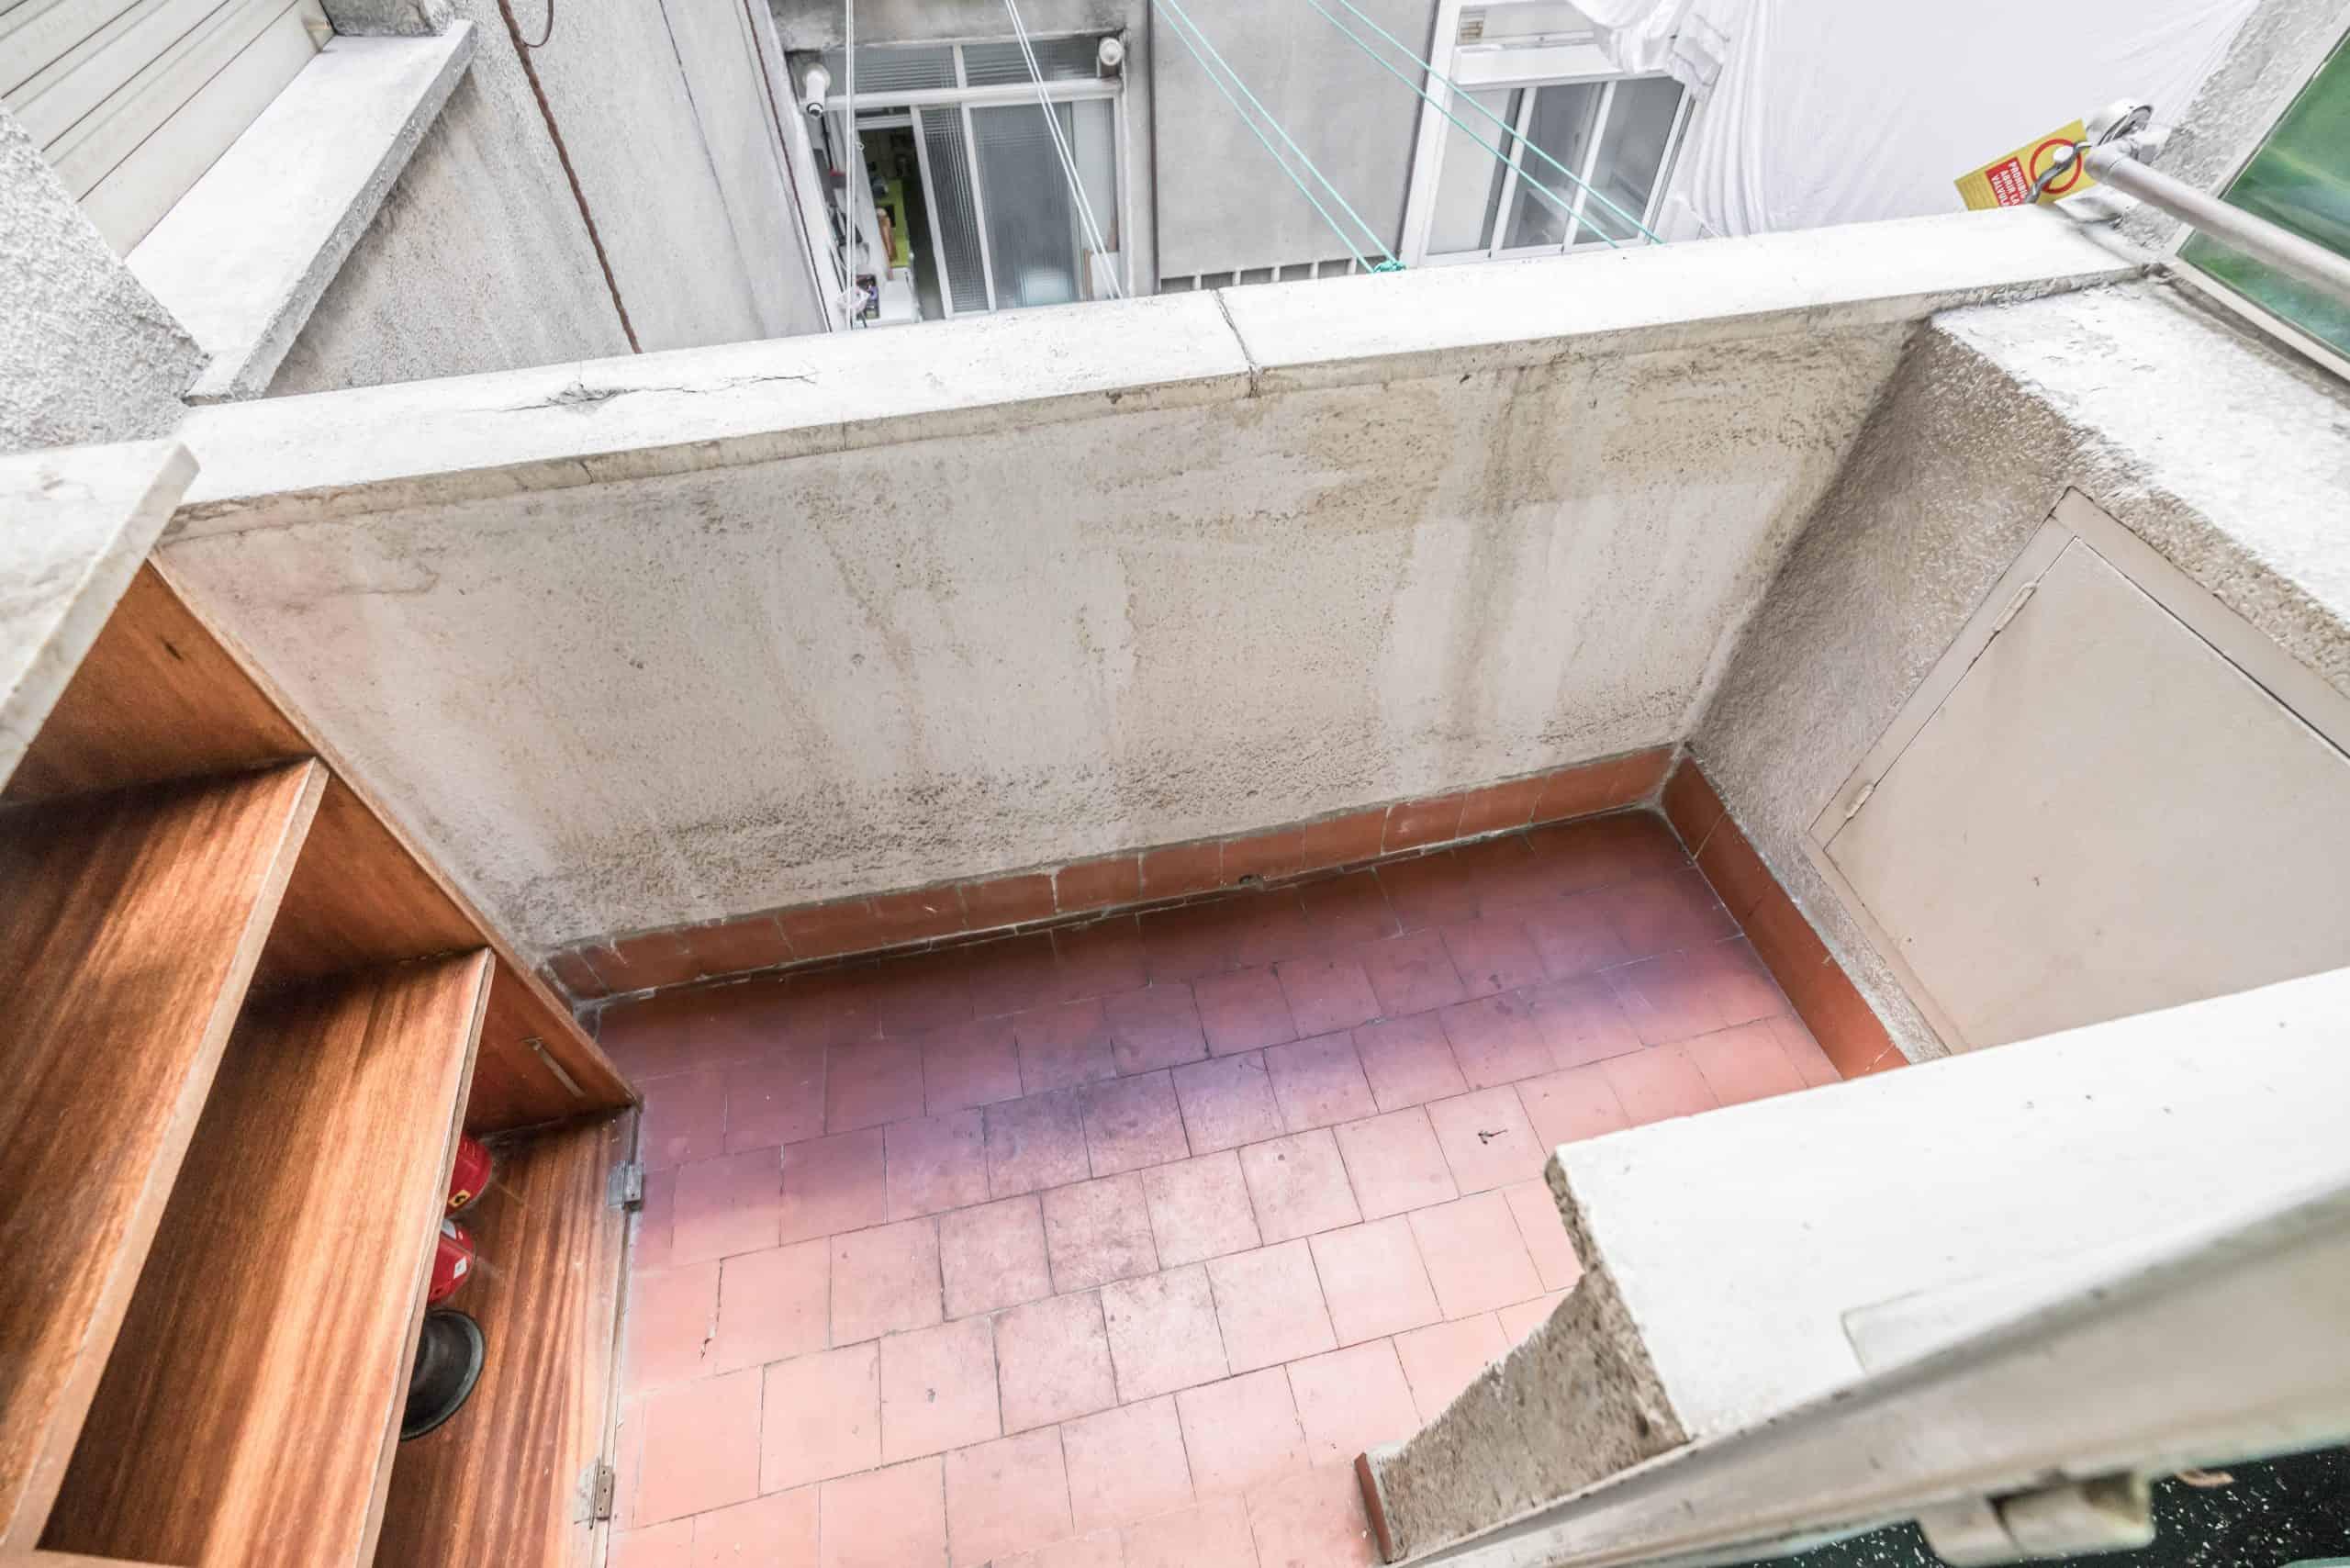 Agencia Inmobiliaria de Madrid-FUTUROCASA-Zona ARGANZUELA-EMBAJADORES-LEGAZPI -calle EMBAJADORES 108-COCINA (8)